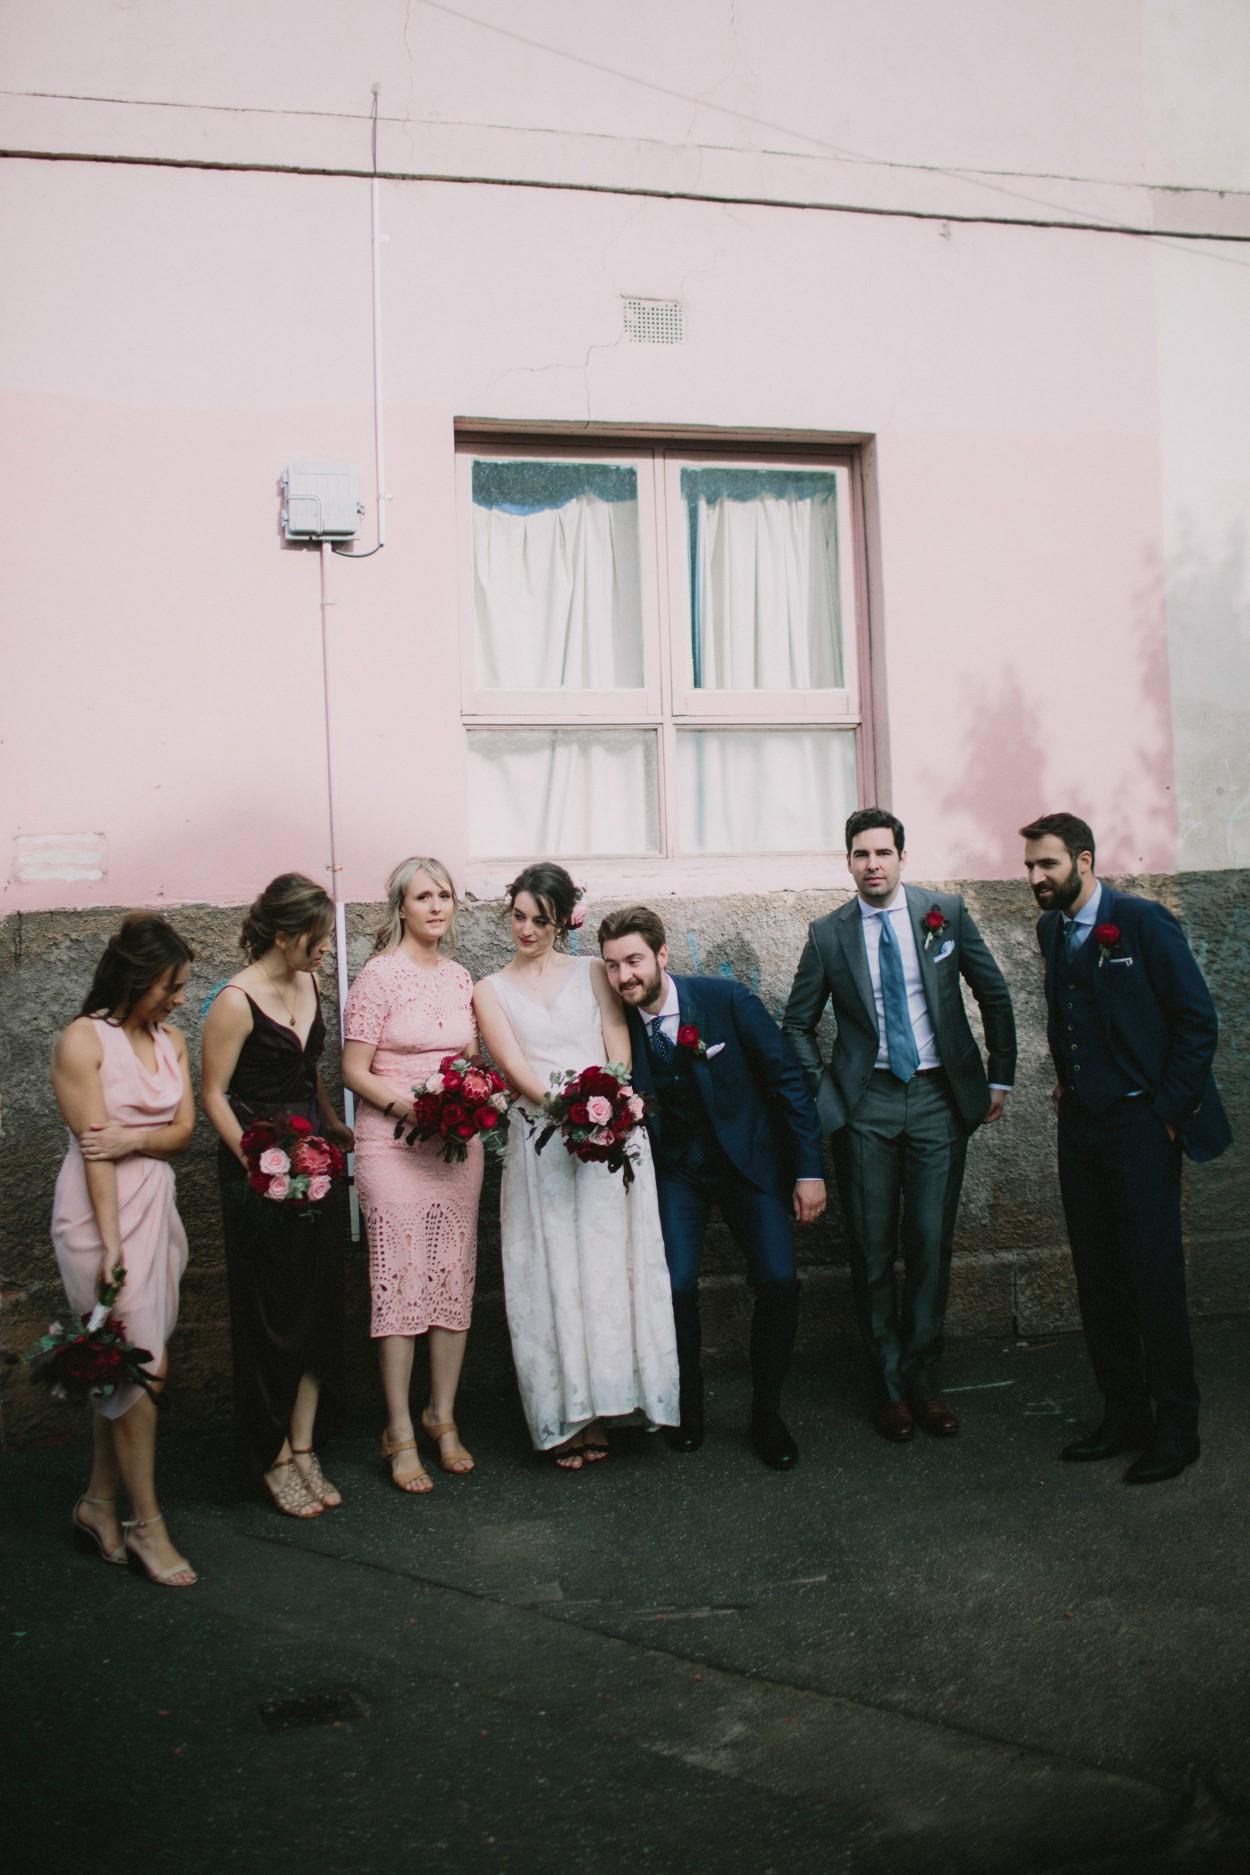 I-Got-You-Babe-Weddings-Fitzroy-Town-Hall-Lauren-Hugo082.jpg